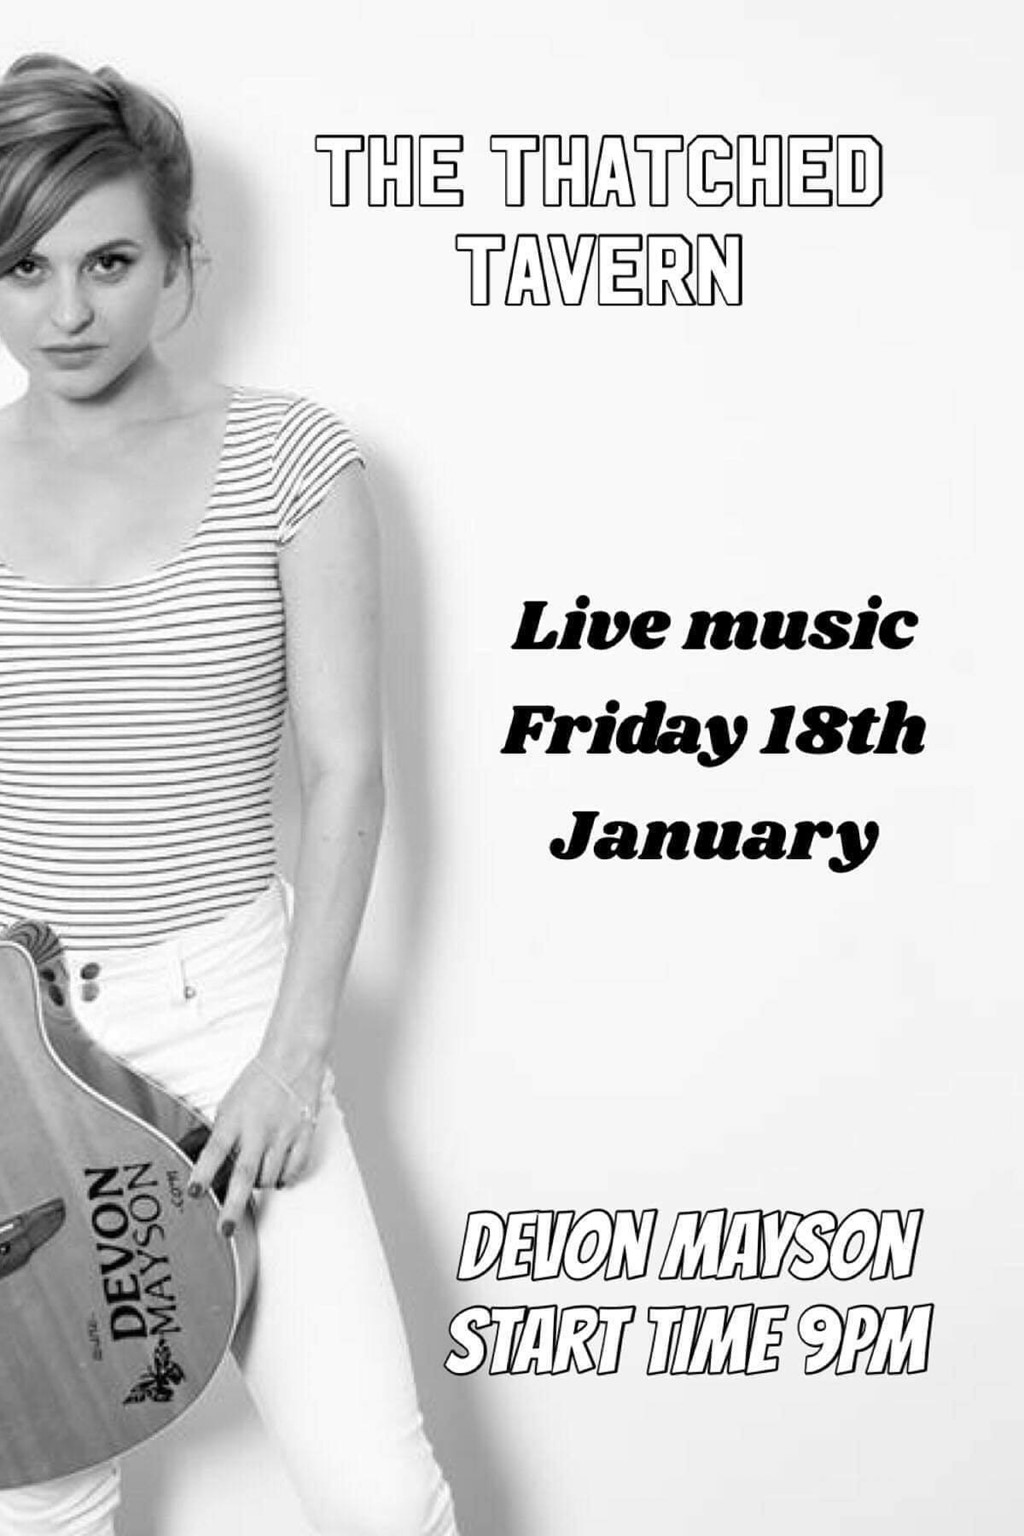 LIVE MUSIC - DEVON MASON